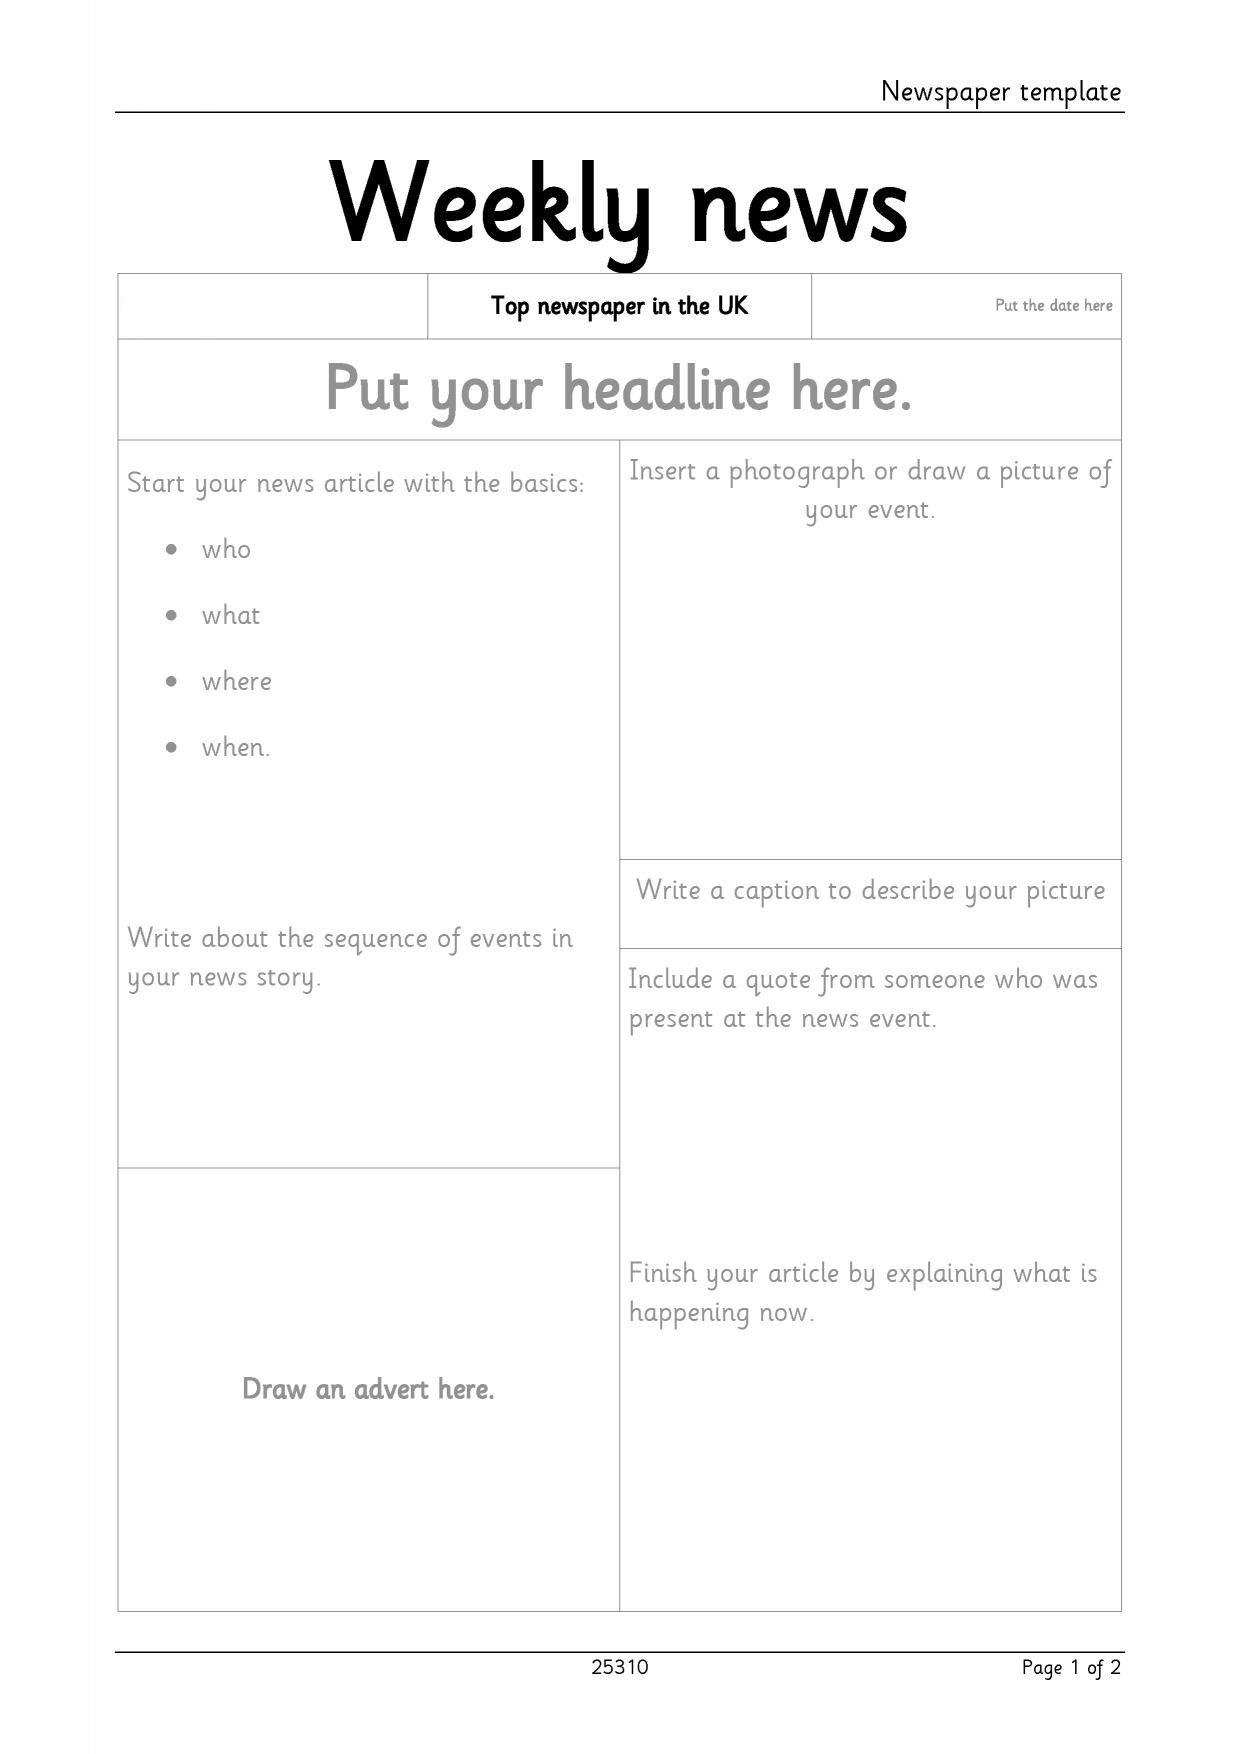 Newspaper Template For Microsoft Word. Newspaper